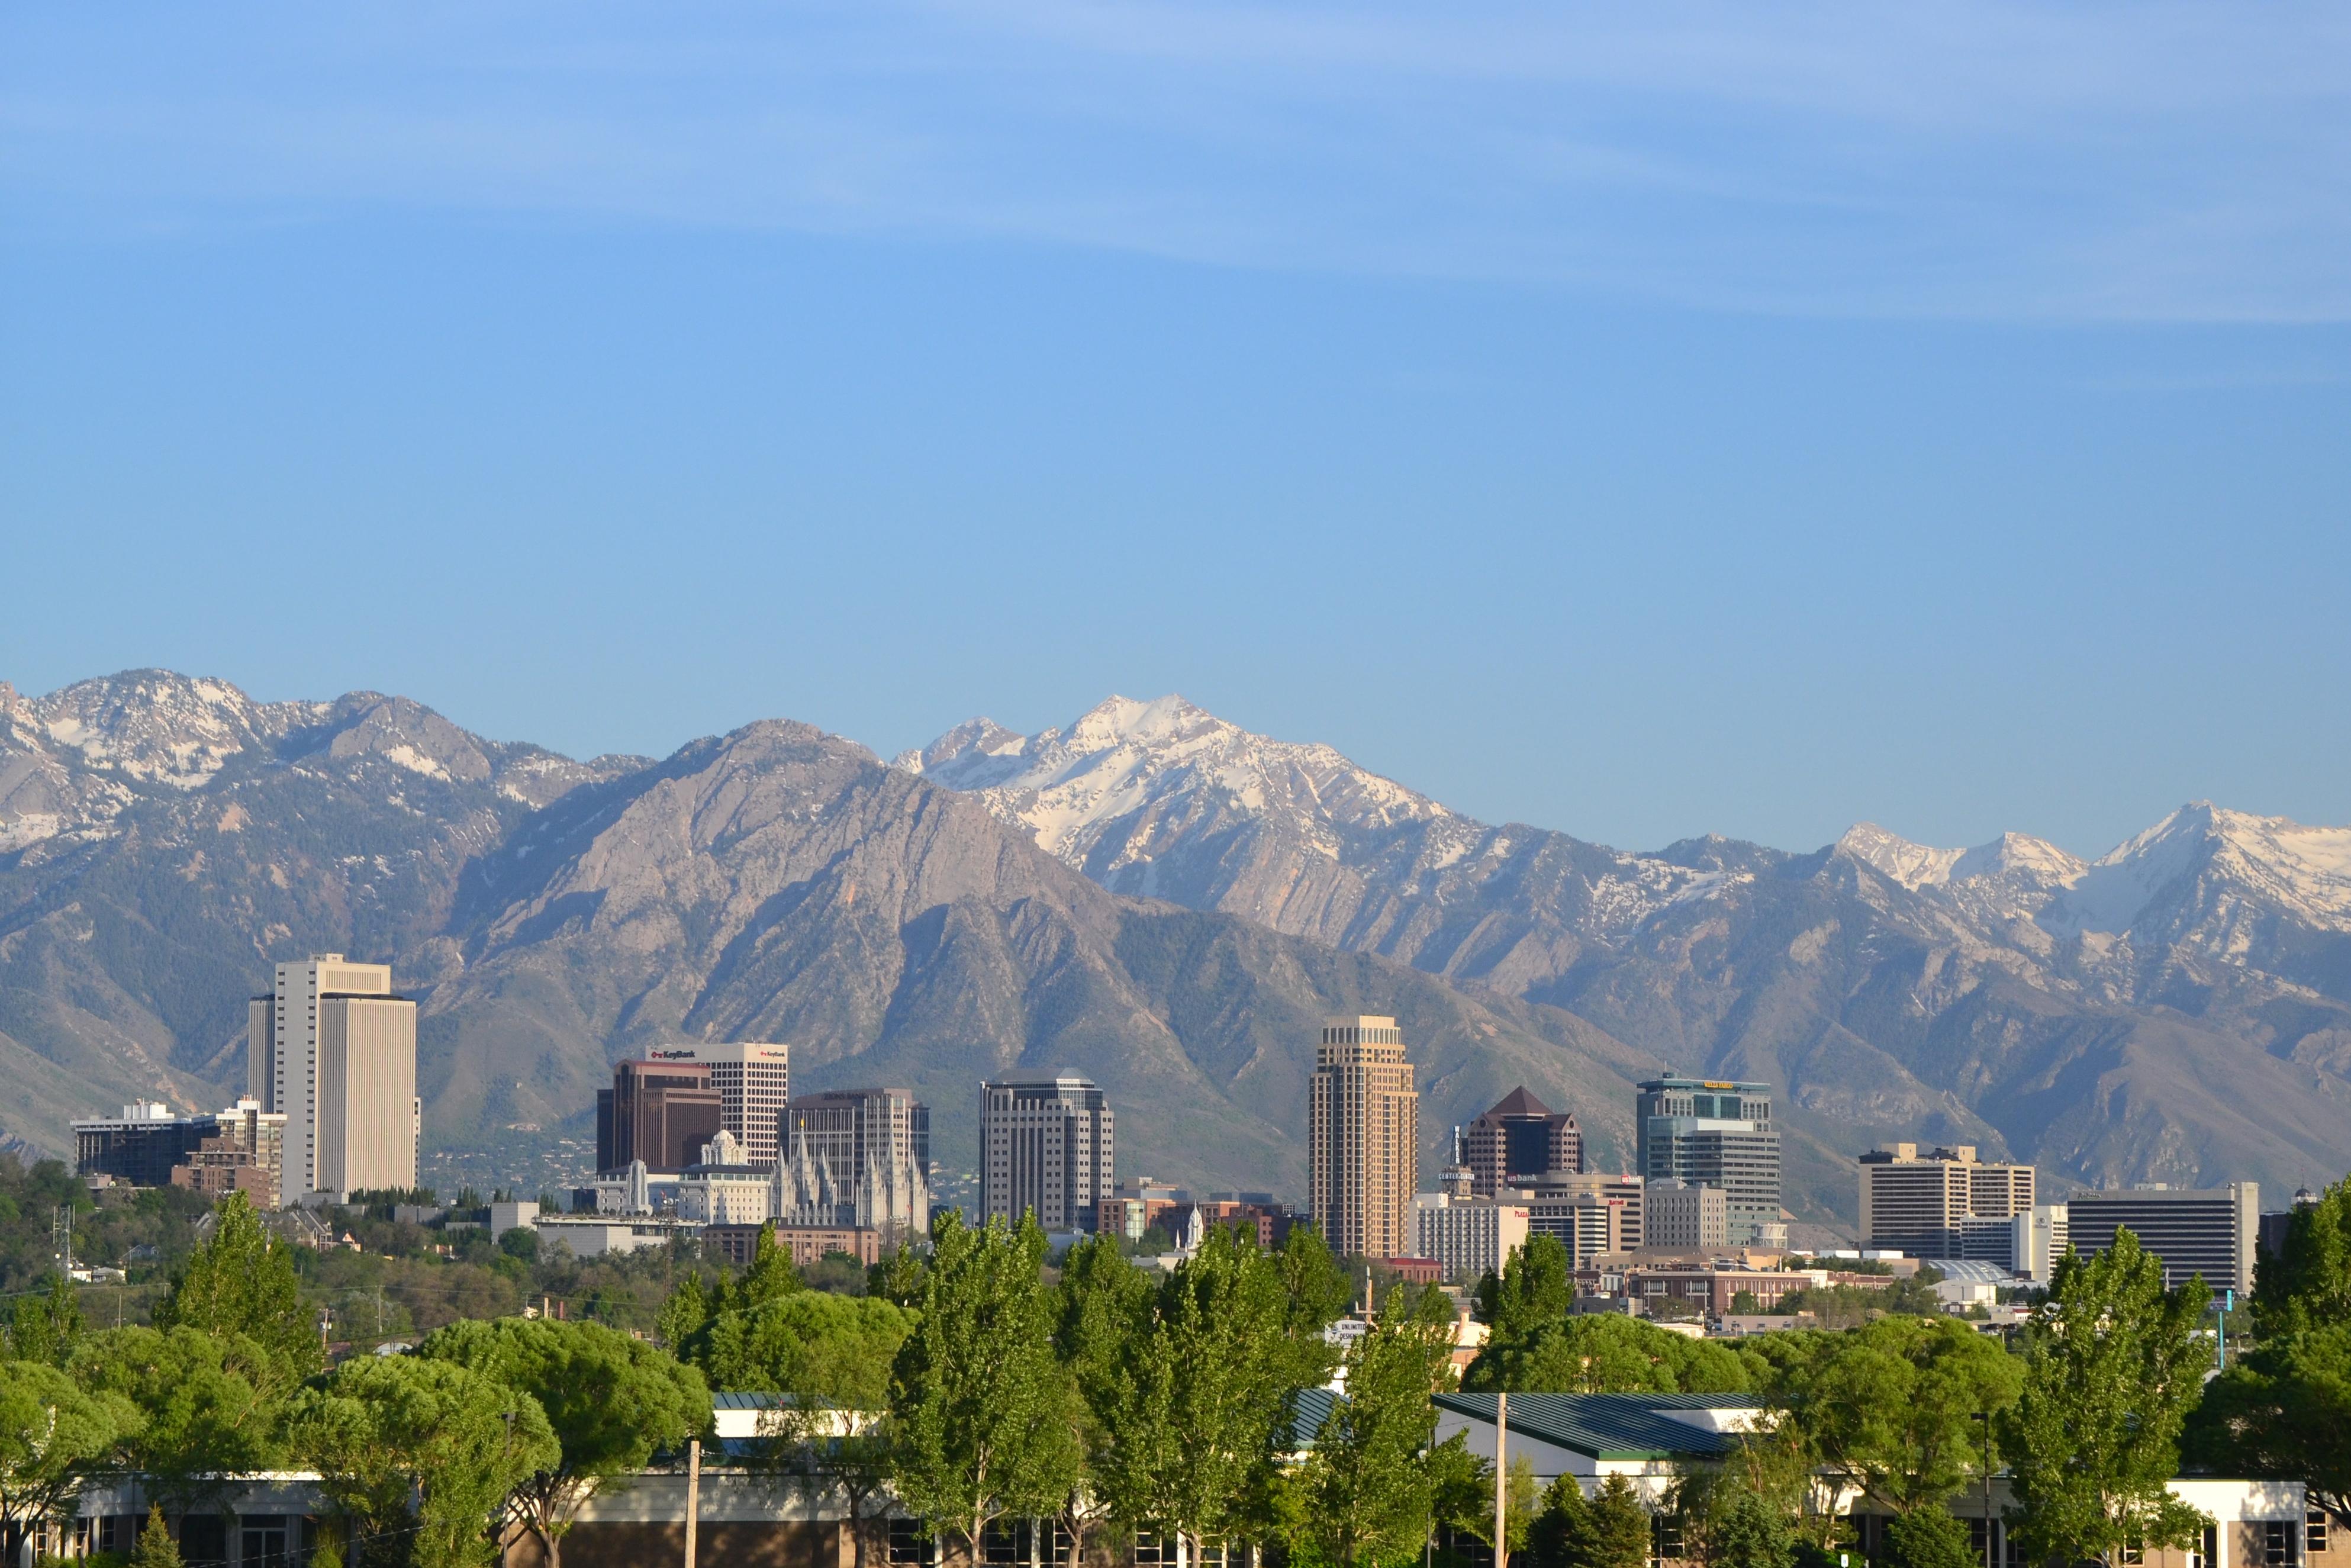 Salt Lake City with an amazing backdrop